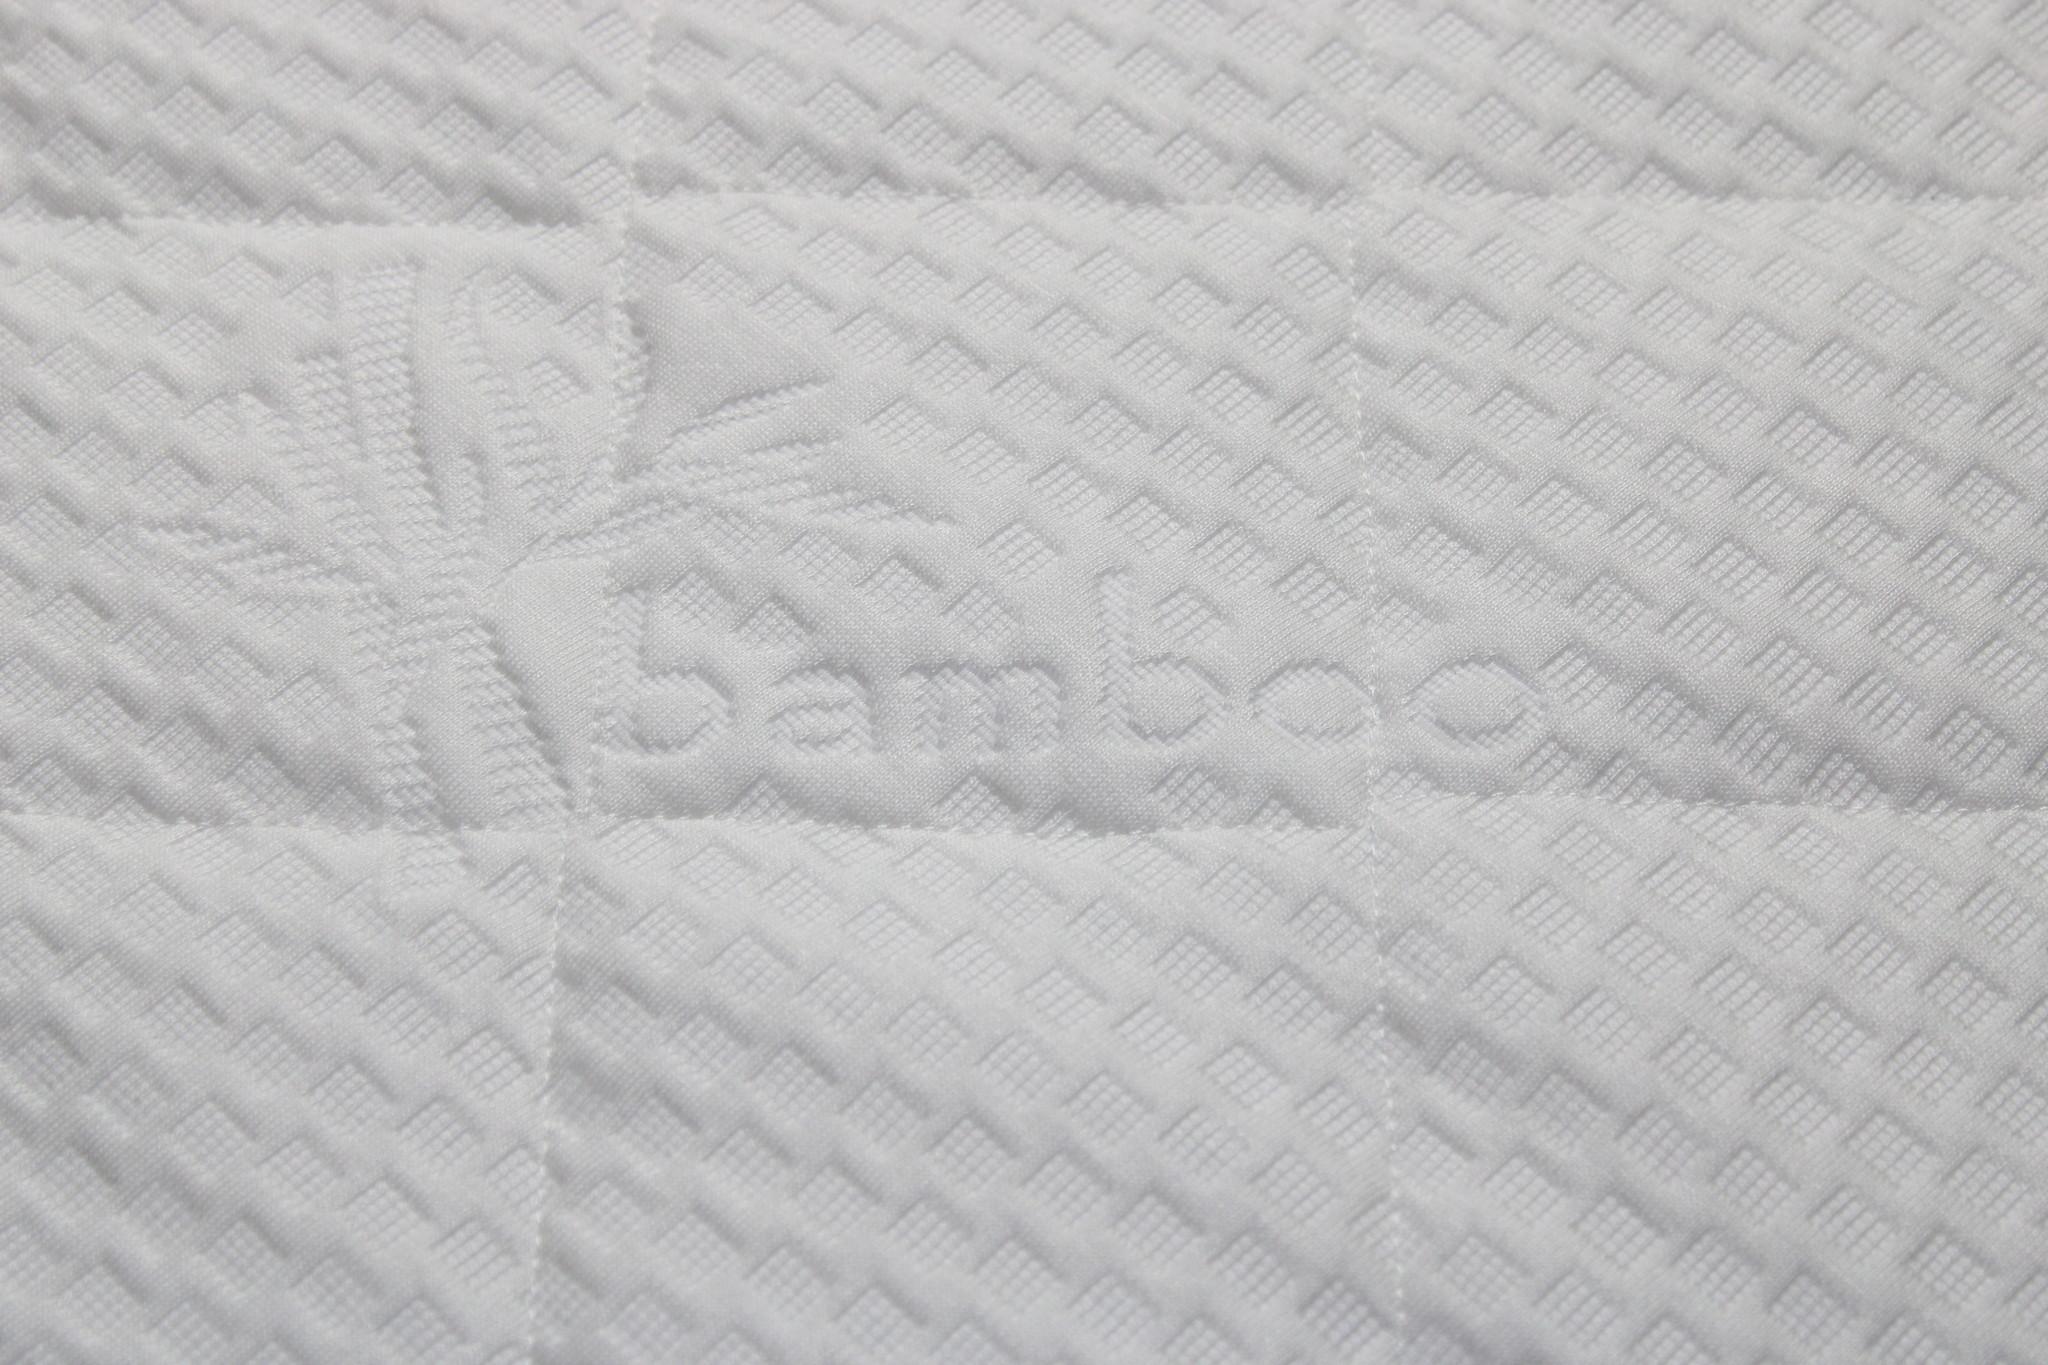 Sarpy Kindermatras 90x200 koudschuim hr40 bamboo